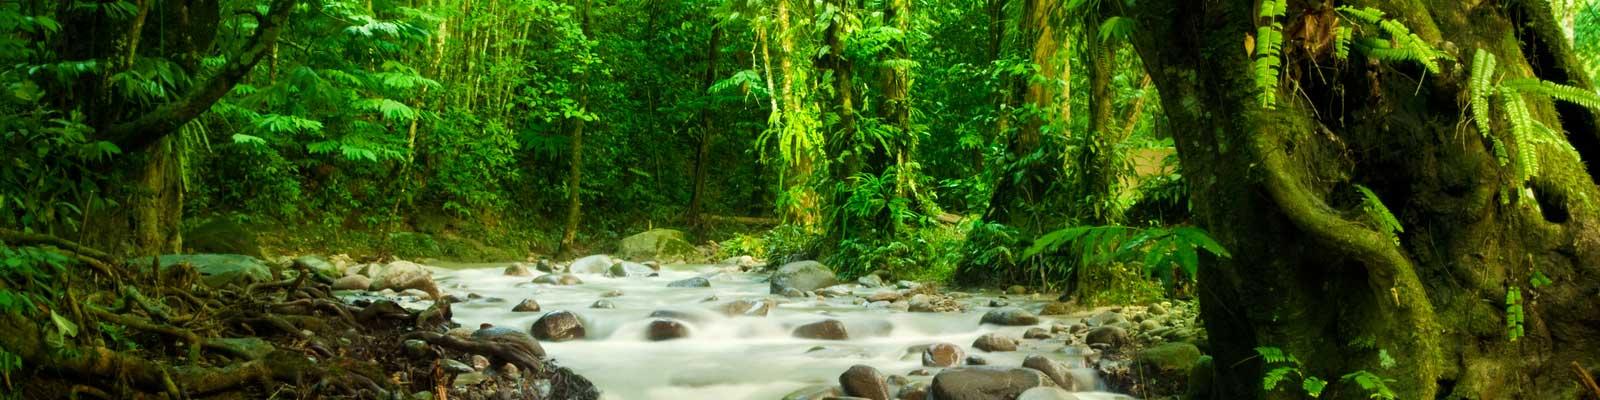 Costa Rica Compre Sua Casa Perto Das Belezas Naturais. Apartamentos, feriados, Luxo.